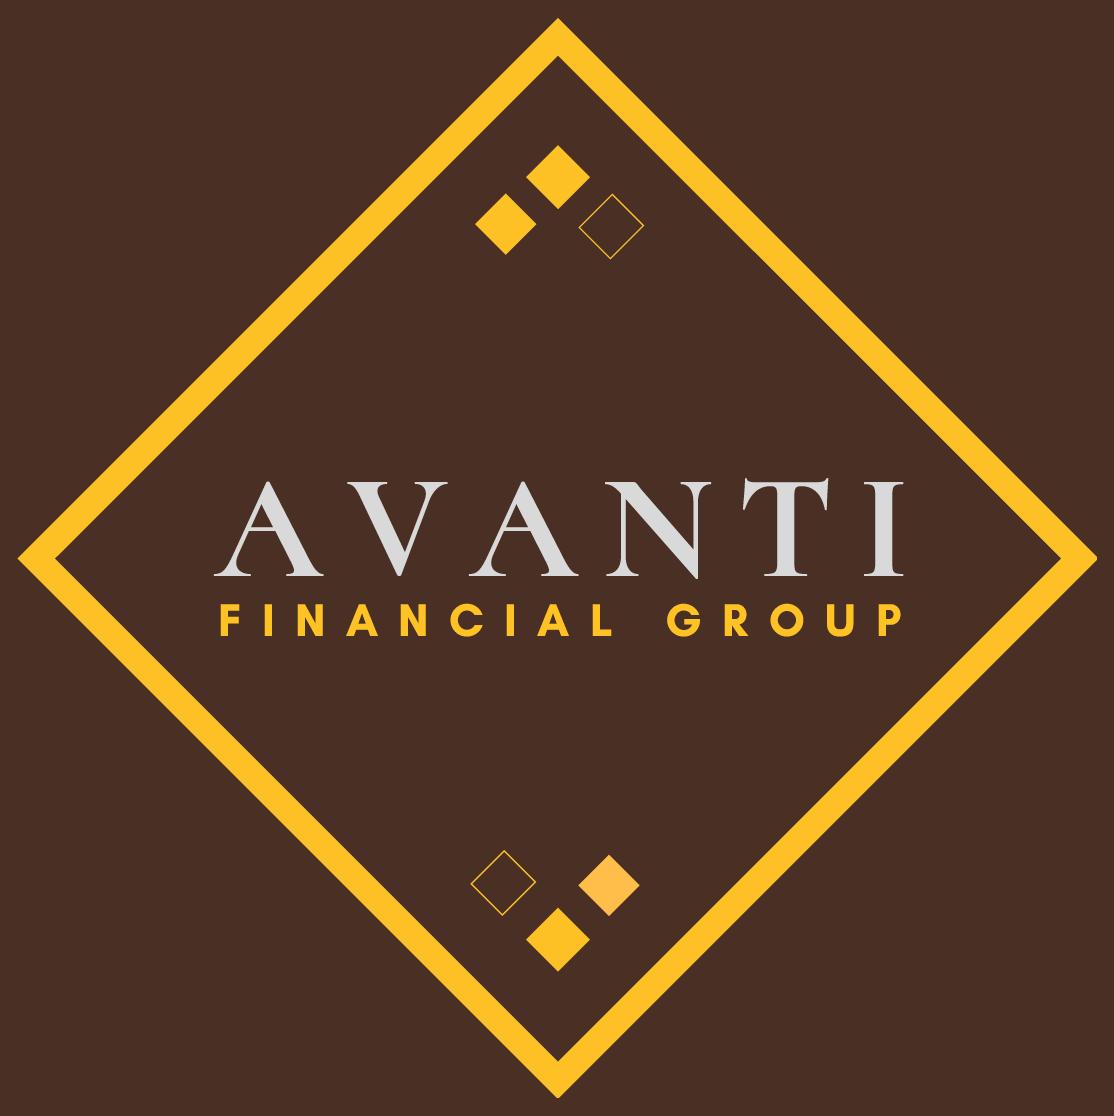 Avanti hires high-profile advisors